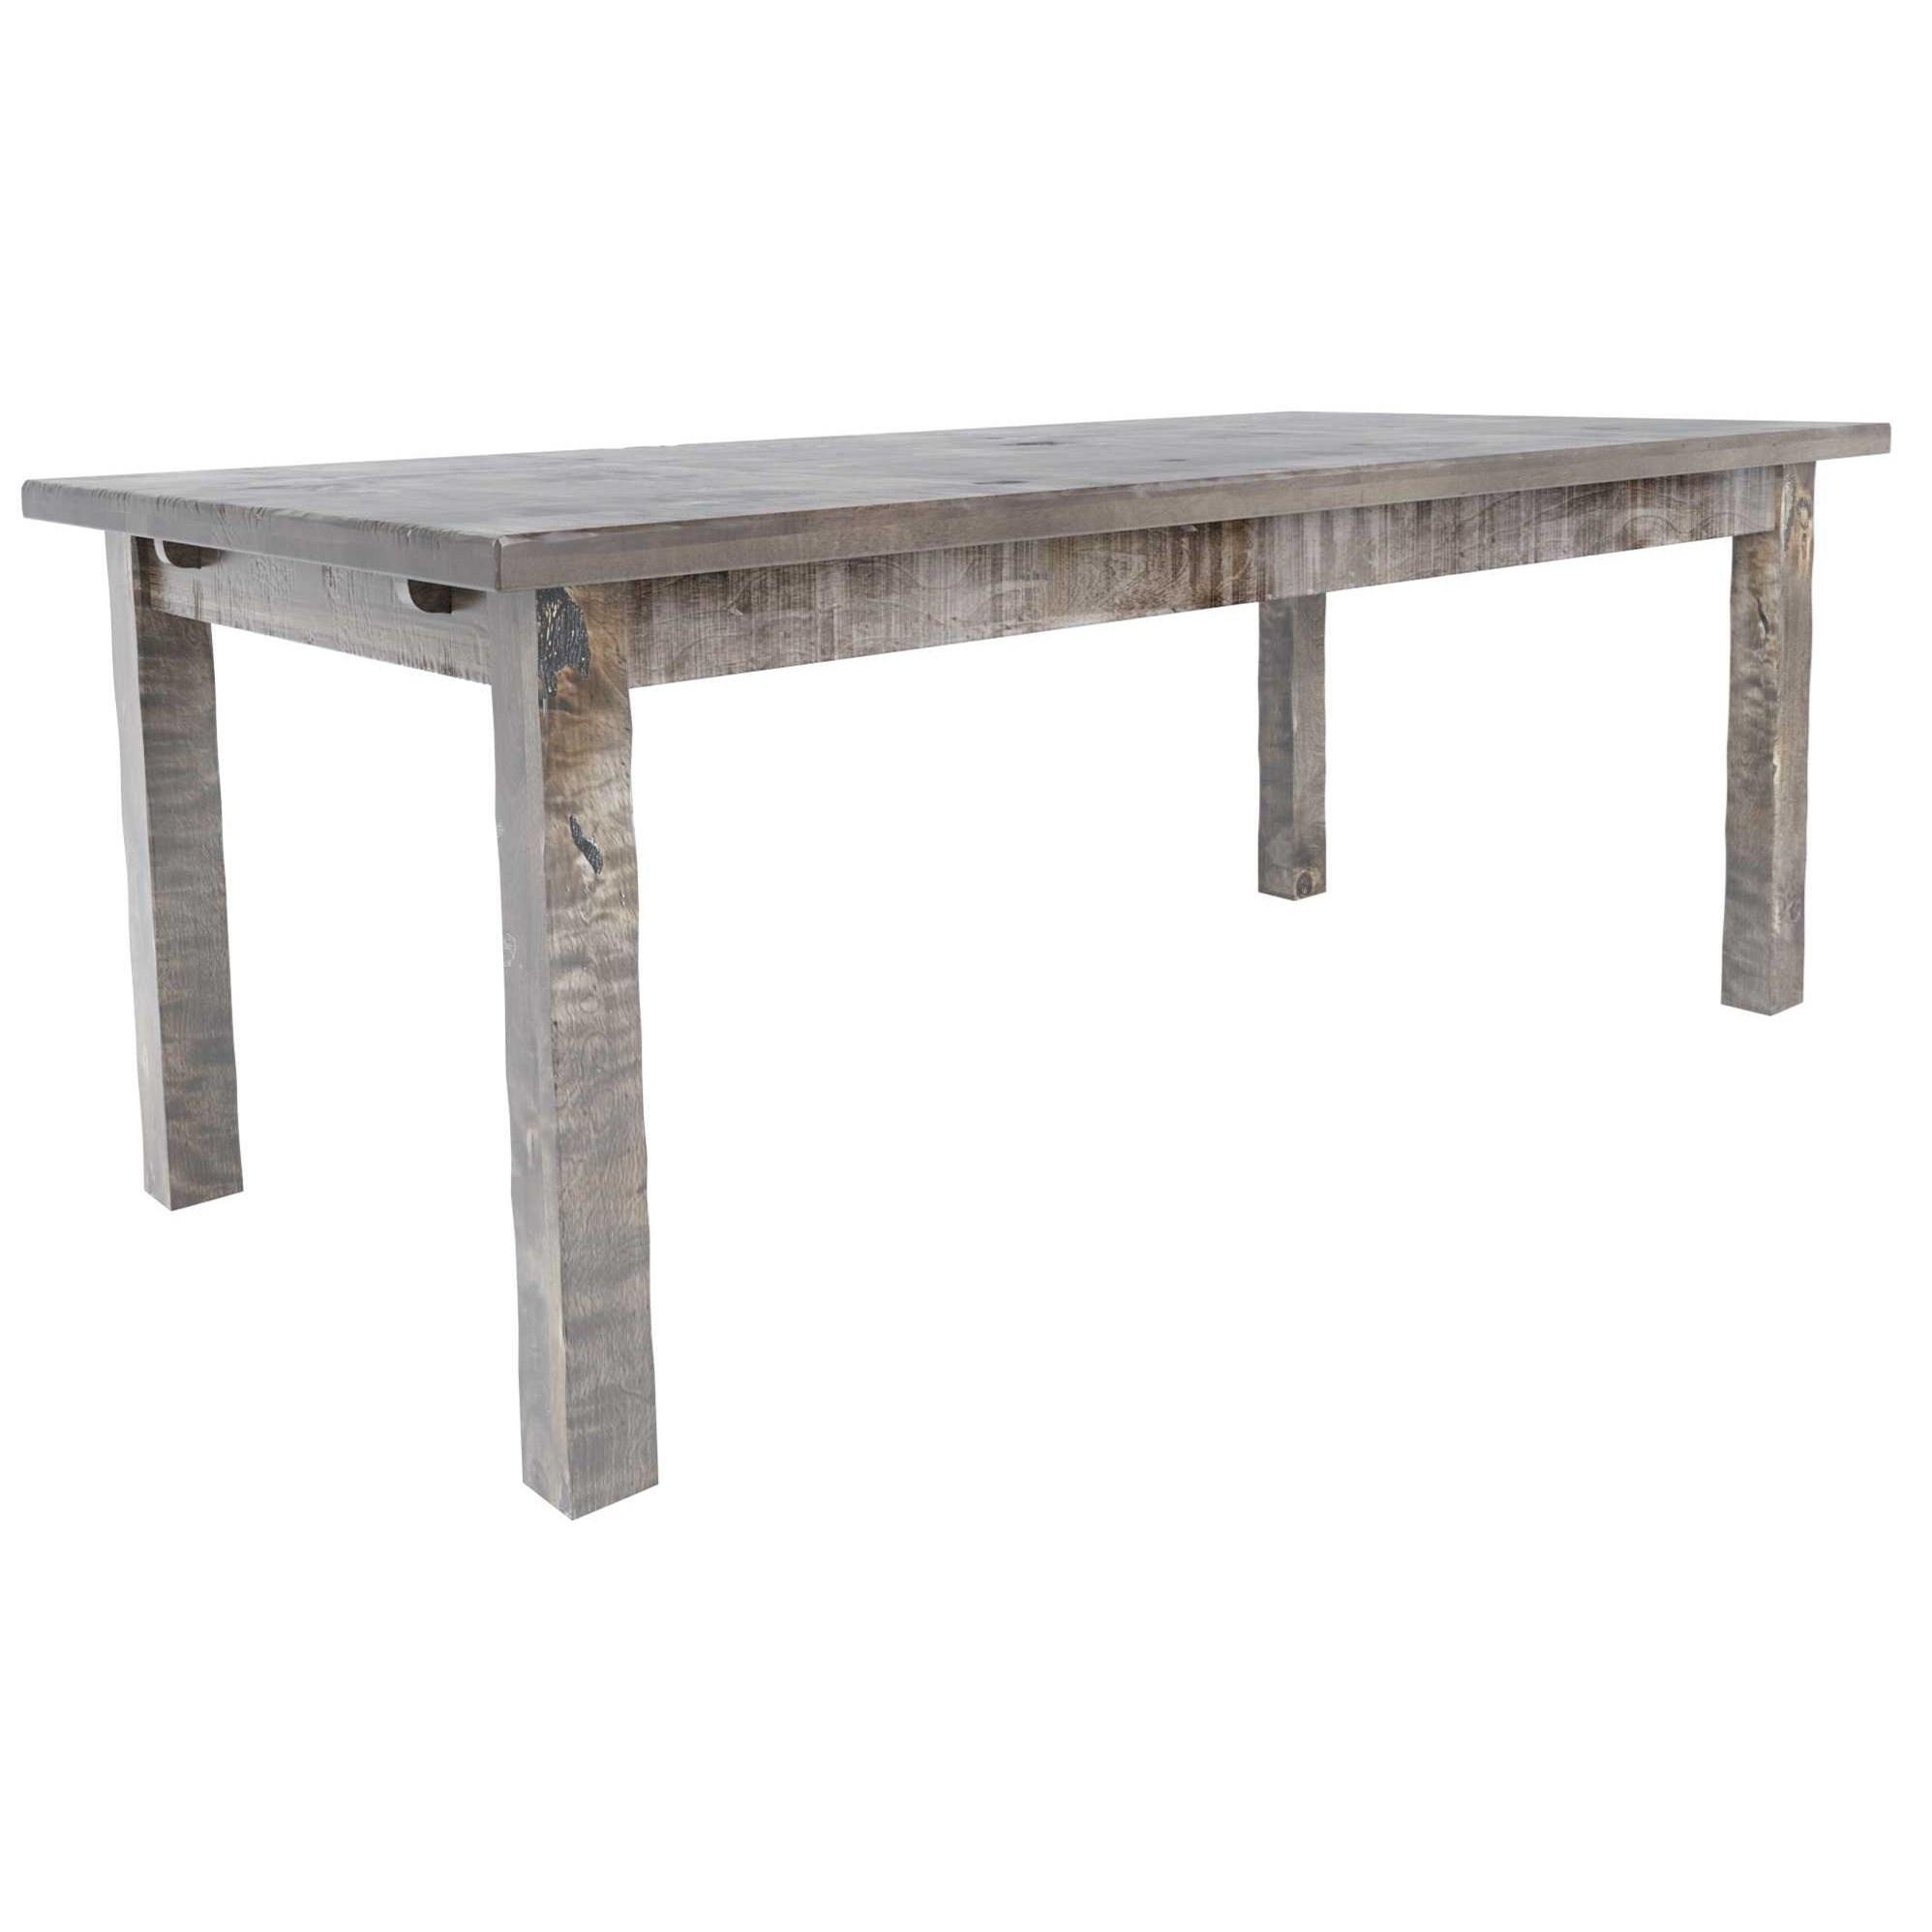 Champlain - Custom Dining Customizable Rectangular Wood Top Table by Canadel at Jordan's Home Furnishings